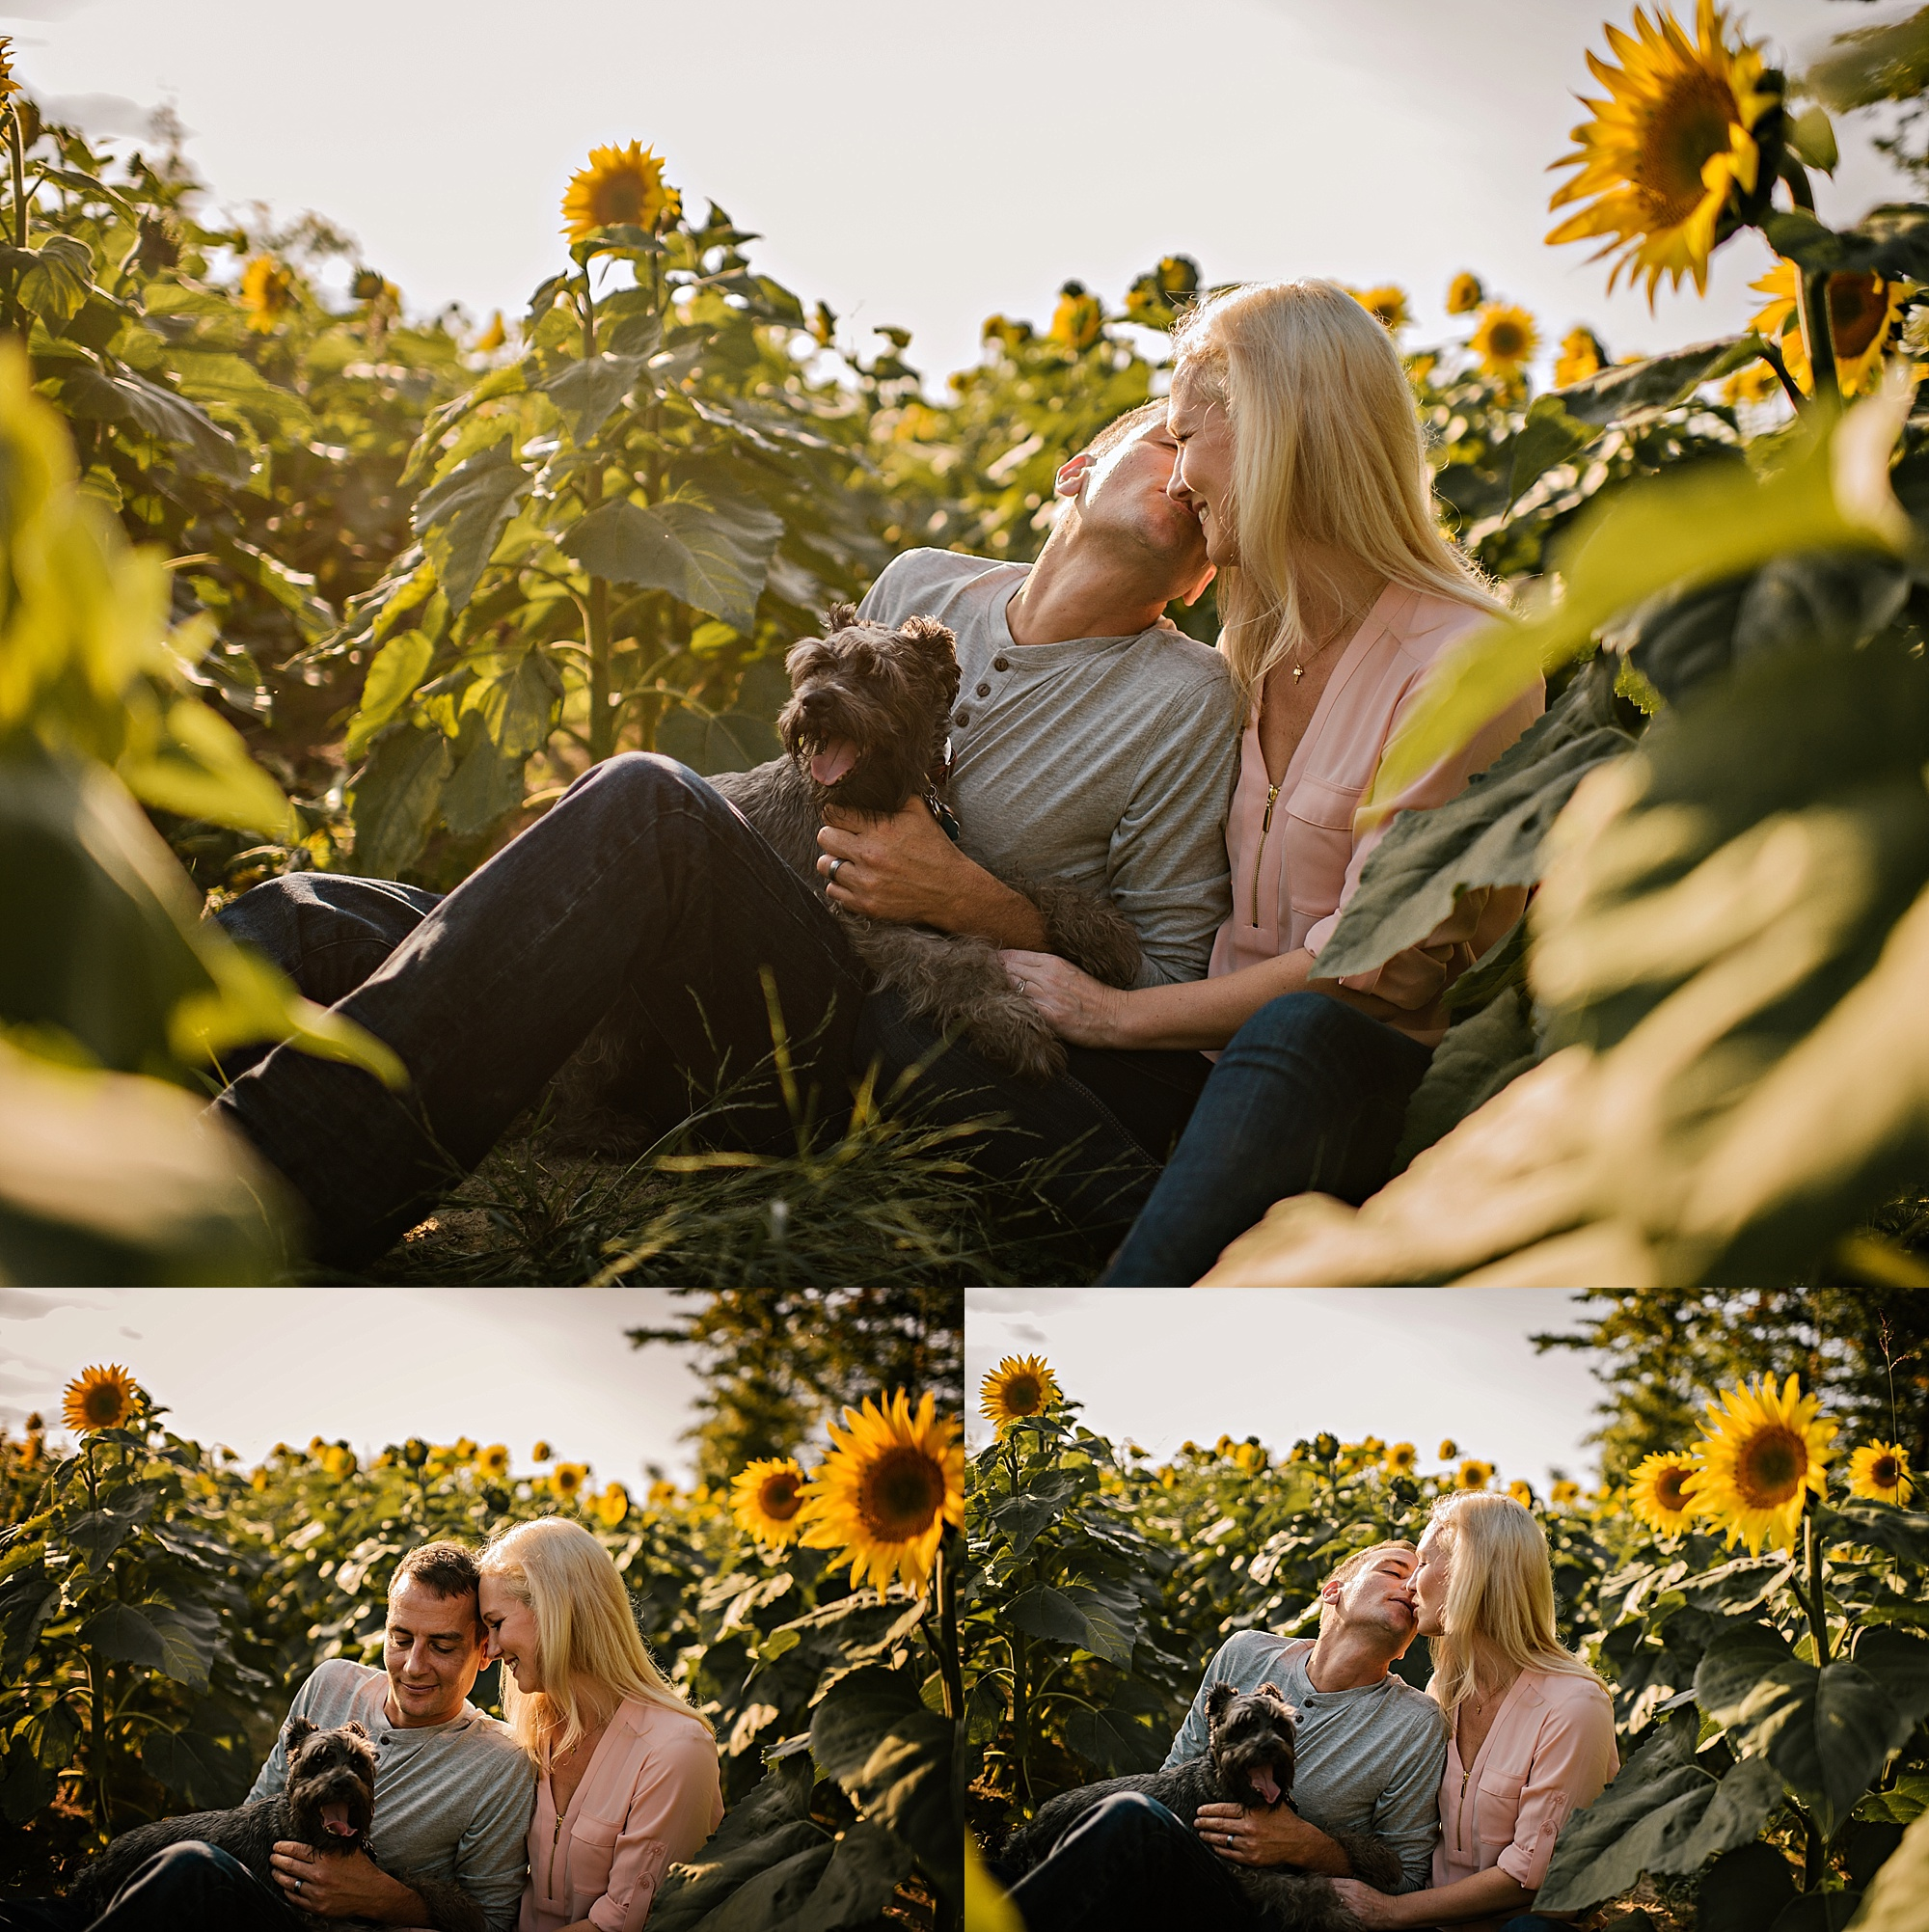 Lori-and-mike-akron-ohio-photographer-lauren-grayson-sunflower-field-session_0020.jpg